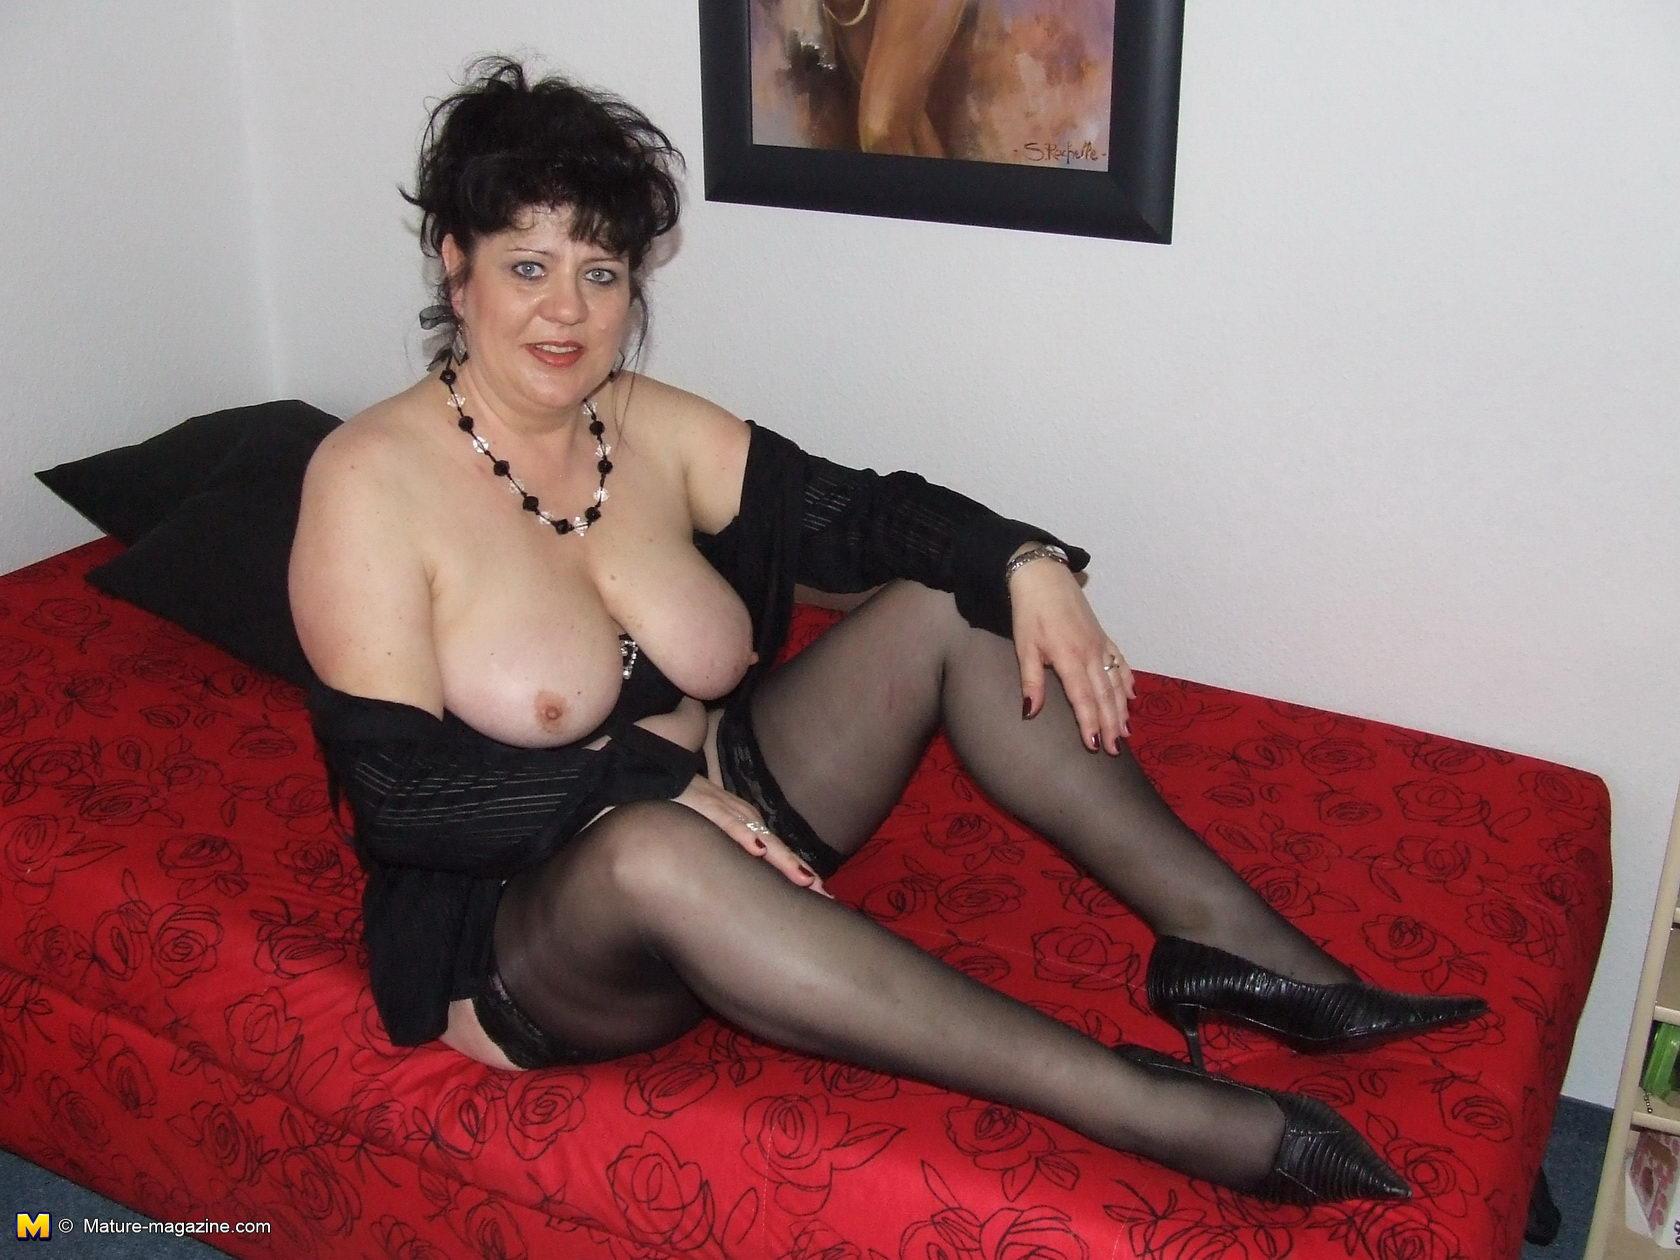 Секс Знакомства С Дамами За 45 В Екатеринбурге